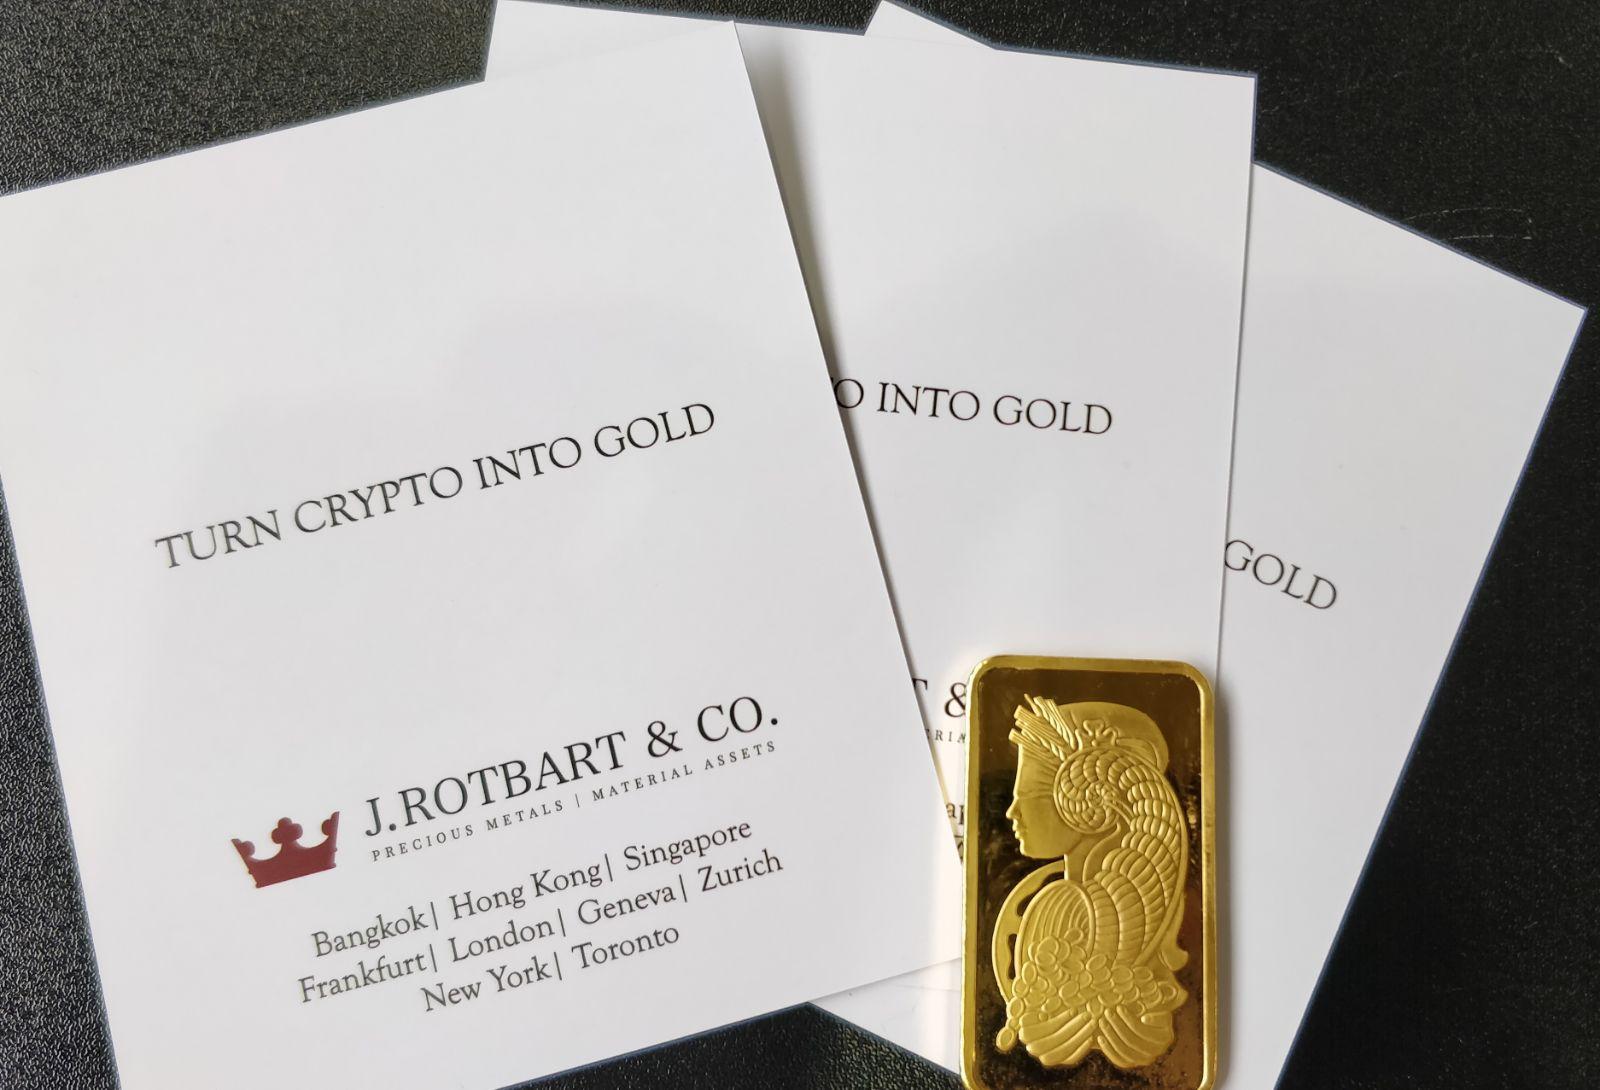 Trading Crypto, Gold and Precious Metals